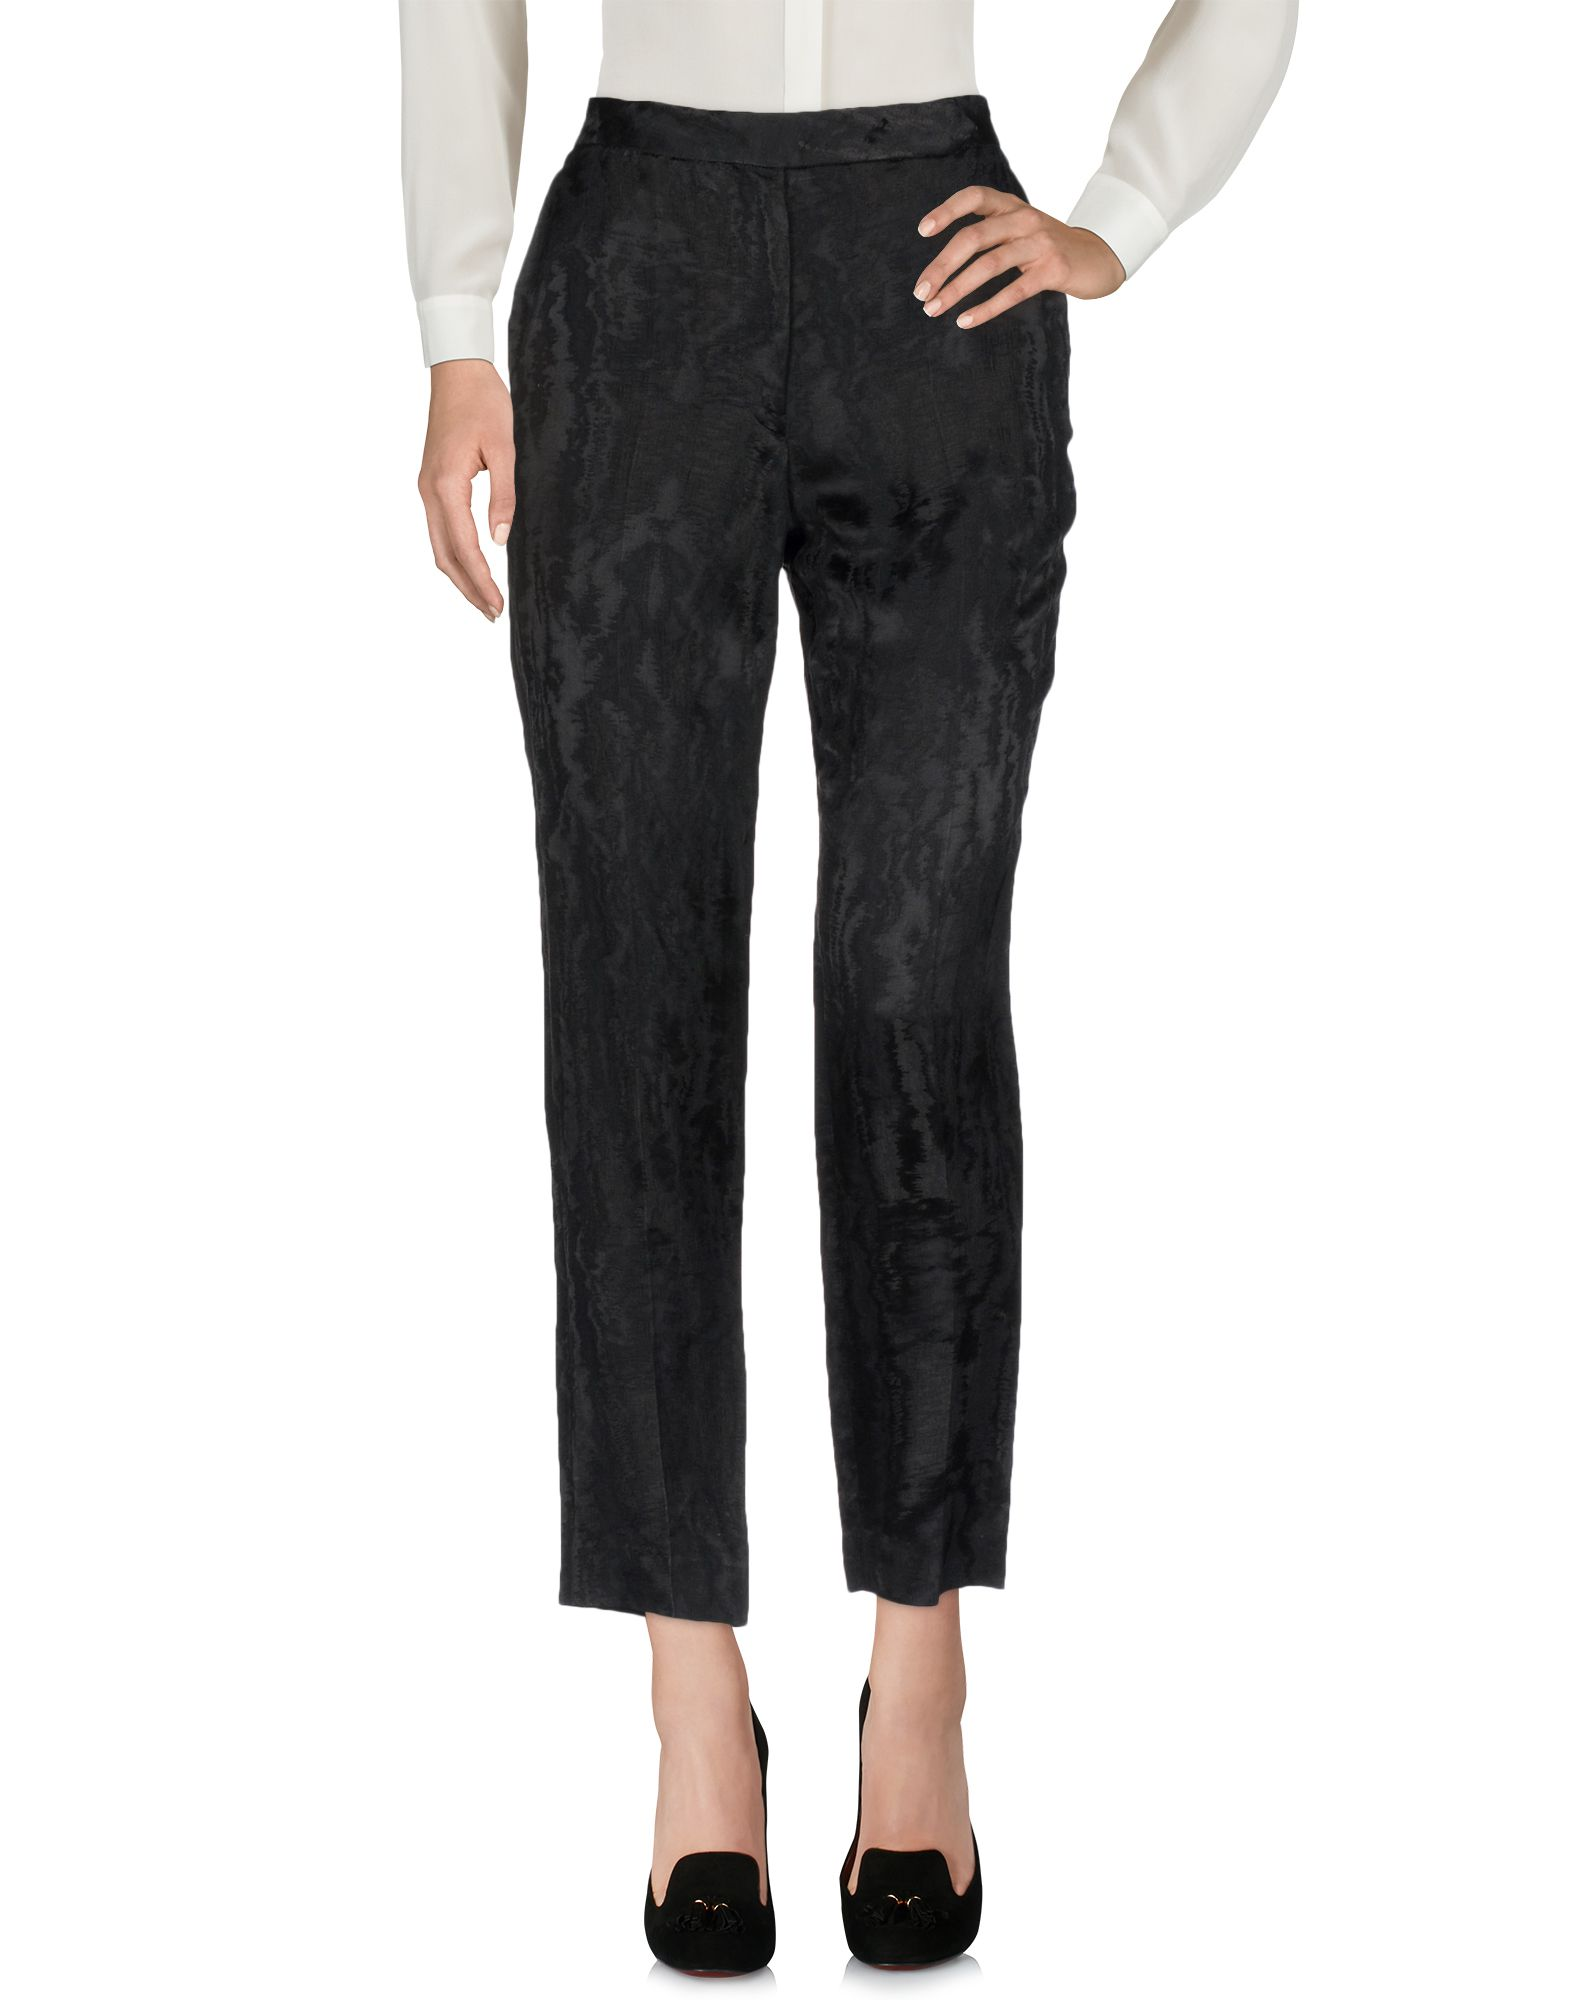 Pantalone Isabel Marant Donna - Acquista online su GmyDaQ